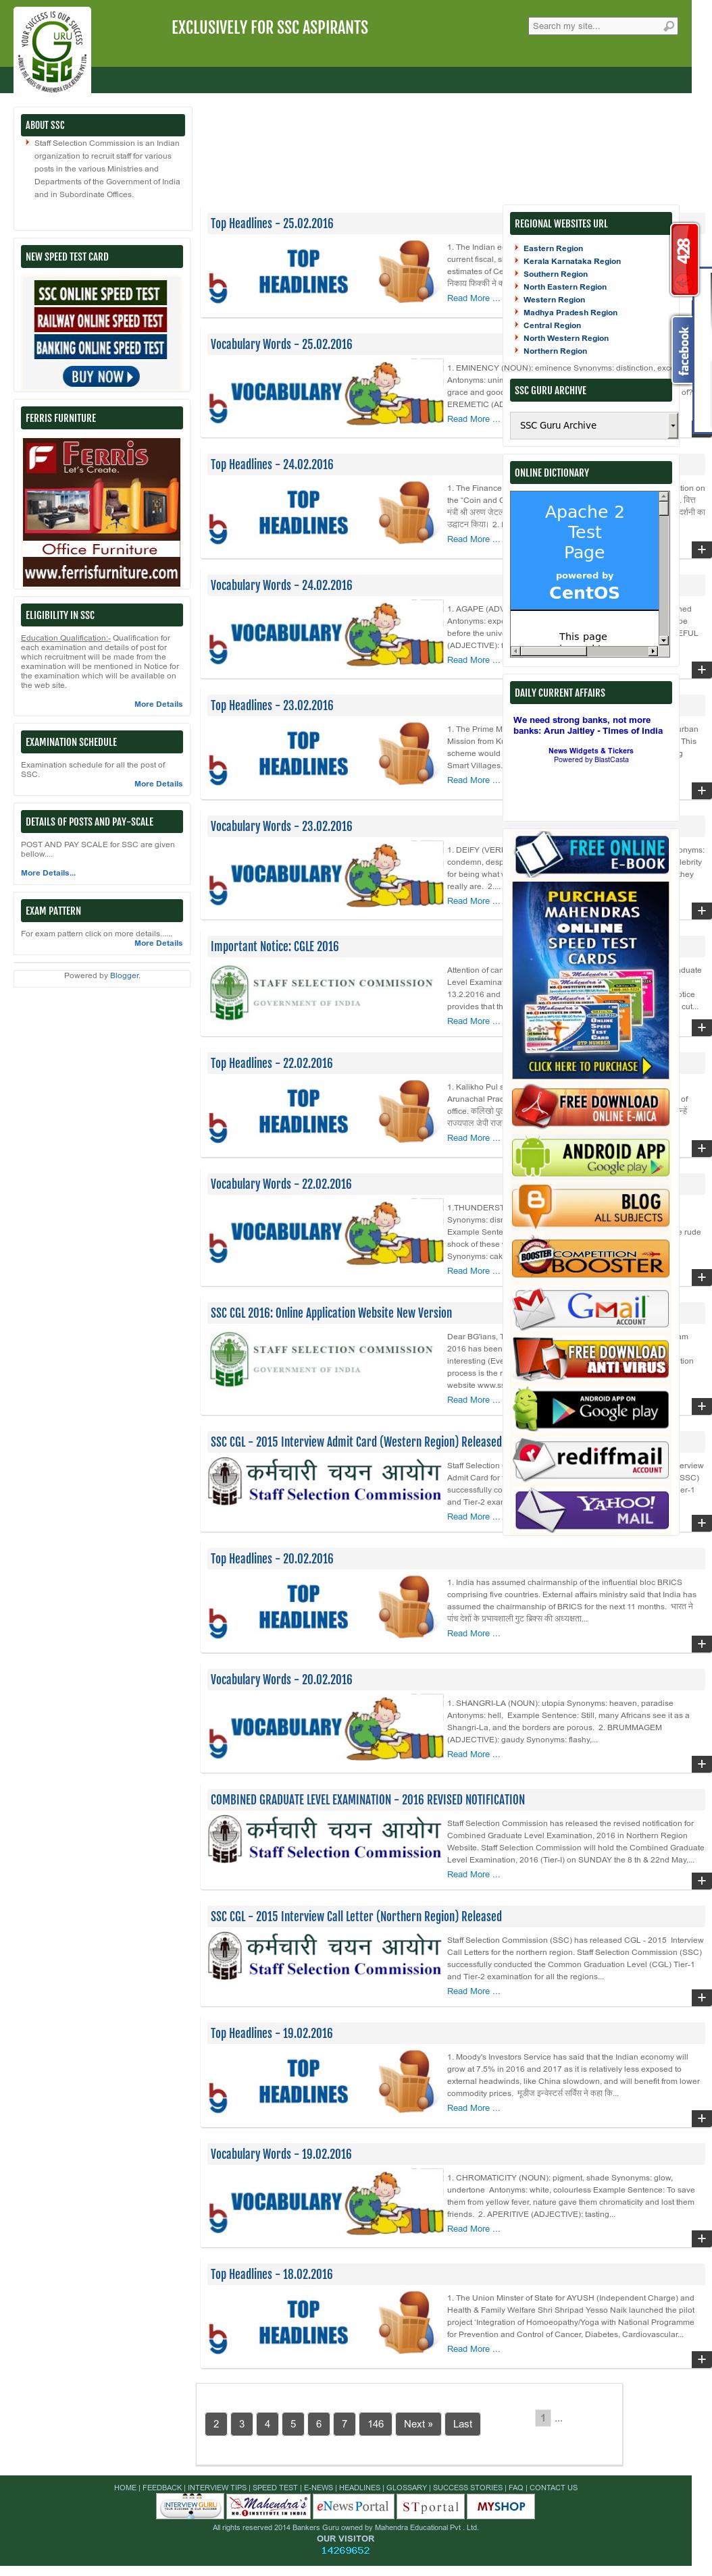 Sscguru Competitors, Revenue and Employees - Owler Company